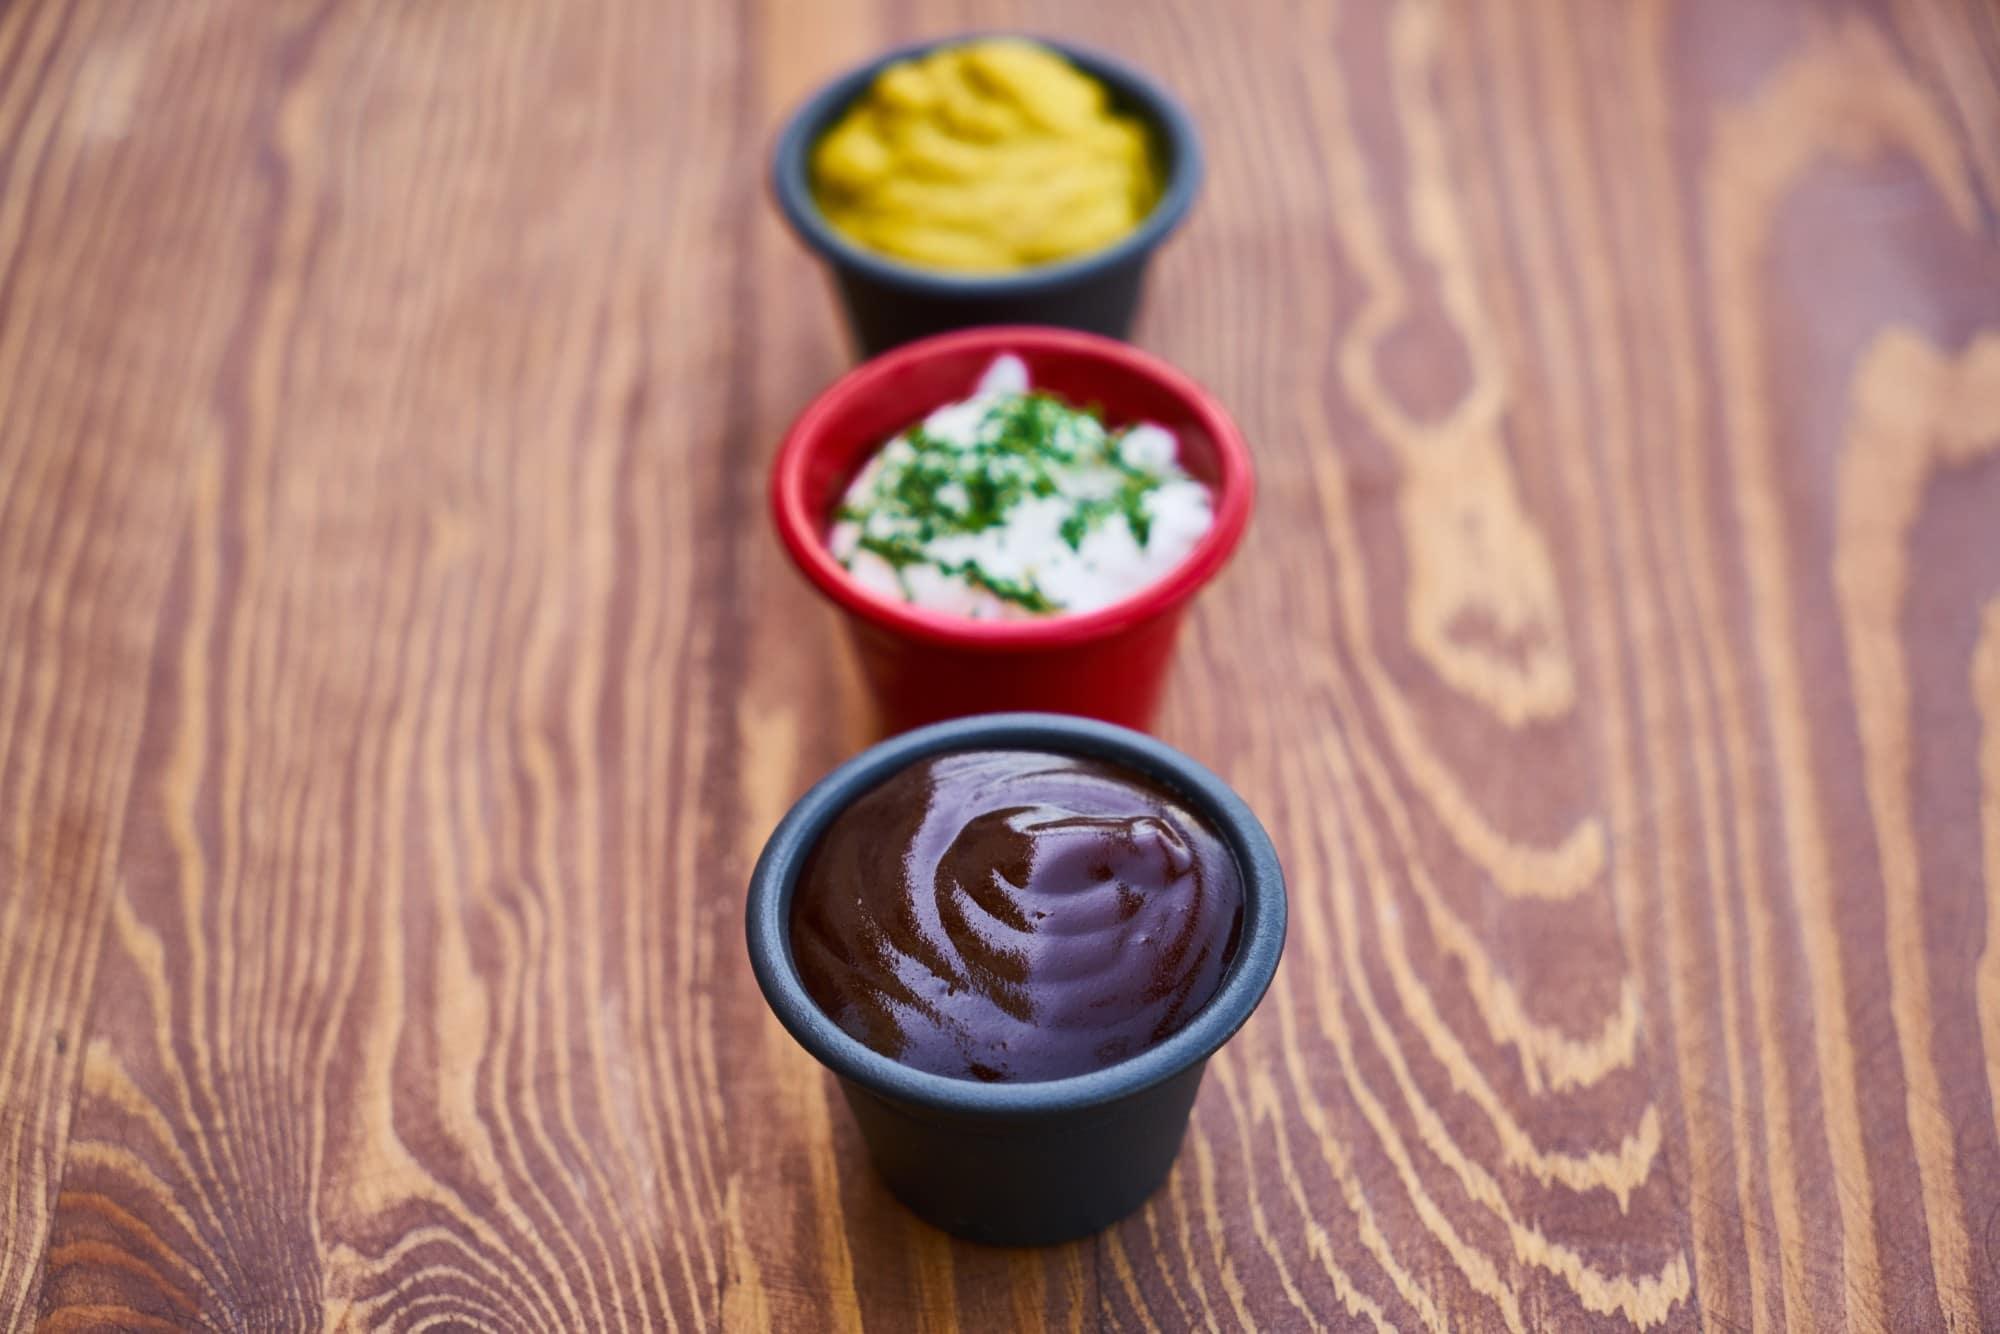 How to Make BBQ Sauce: Homemade BBQ Sauce Recipe